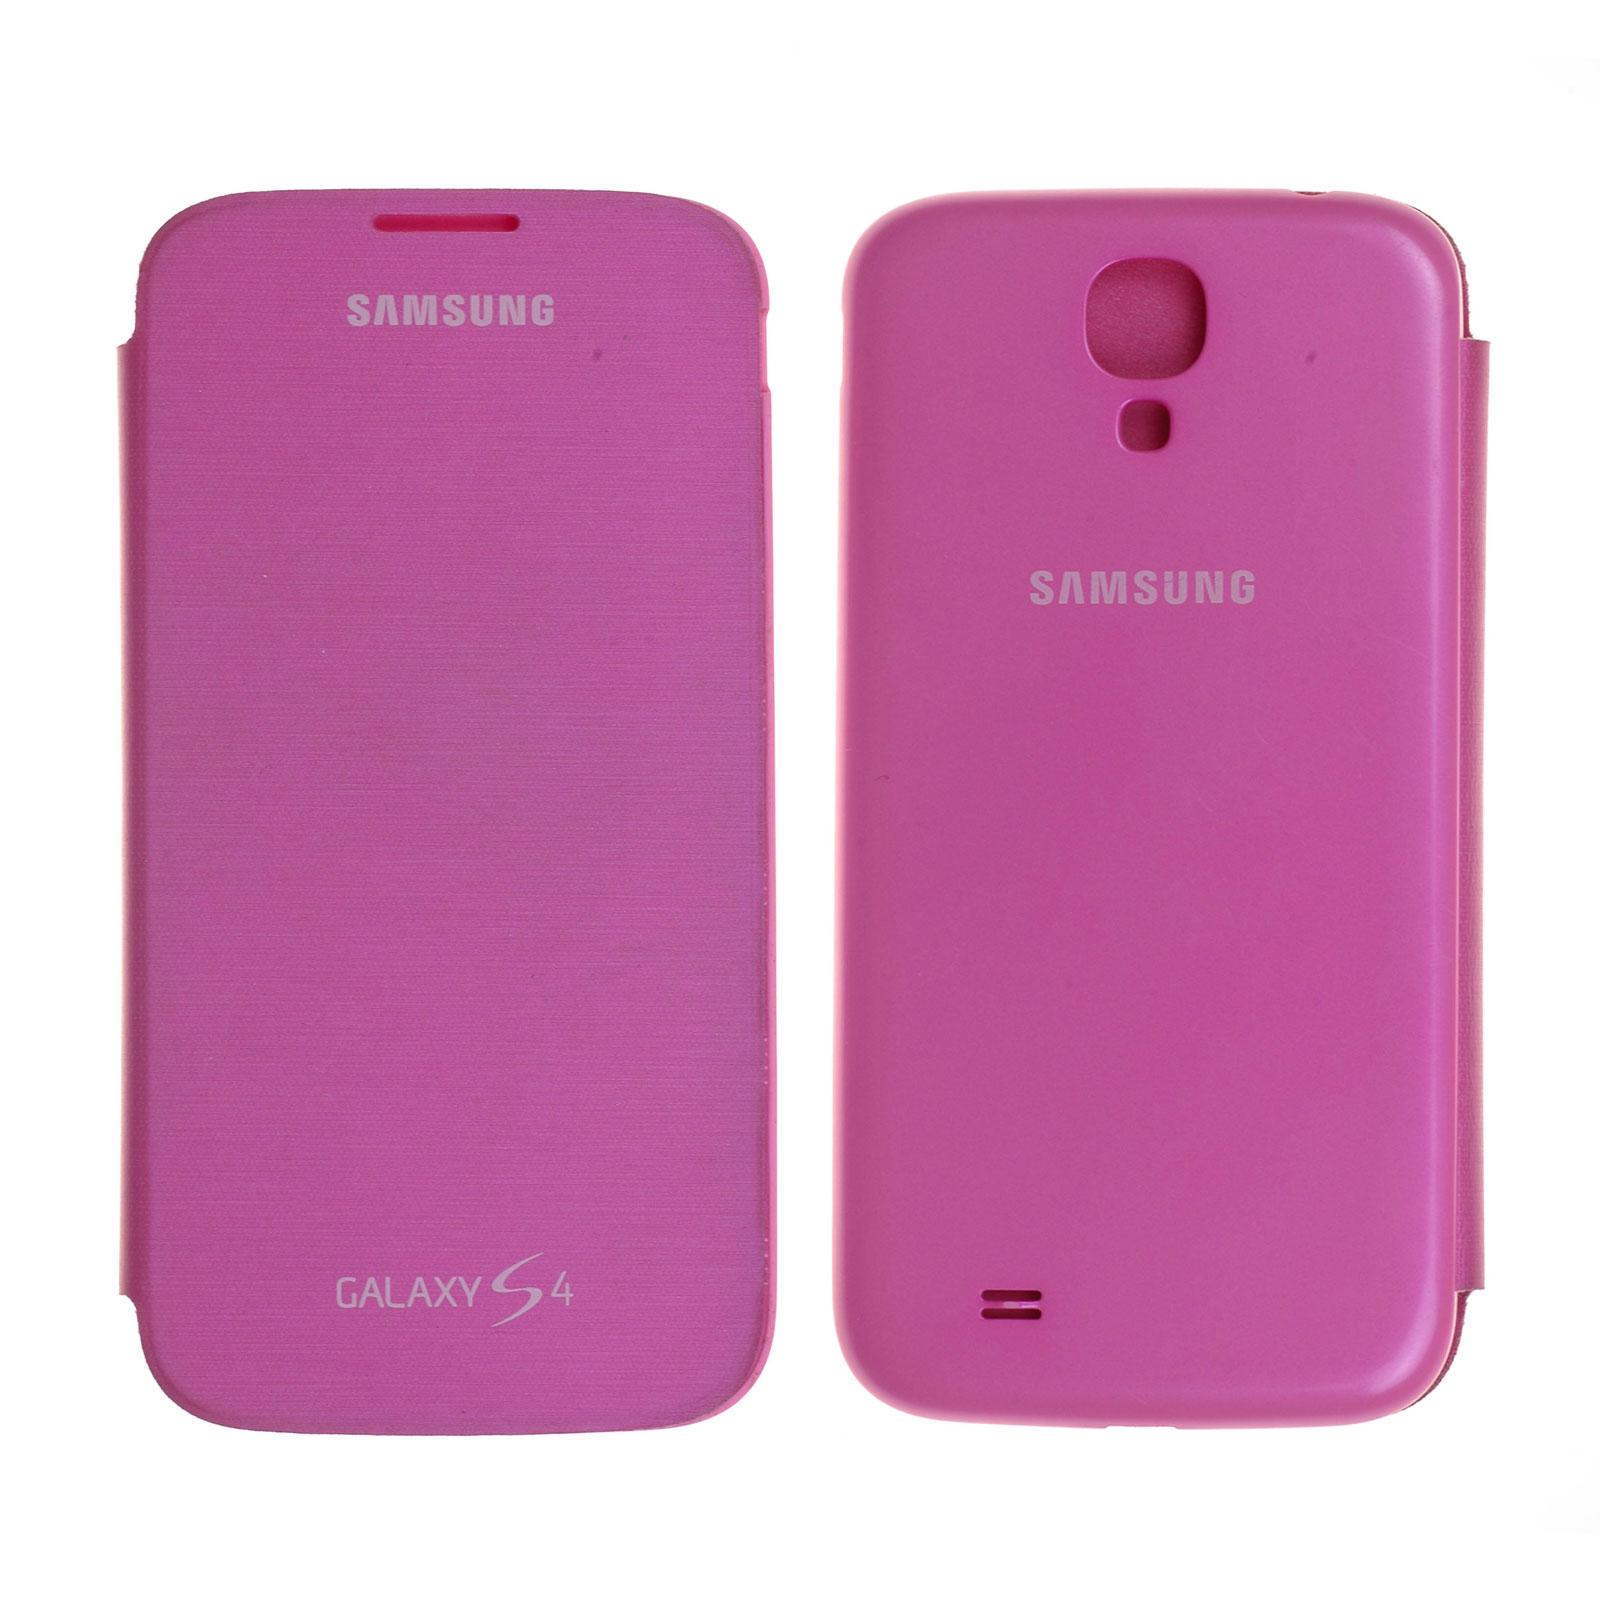 Coque arrière avec rabat d'occasion Samsung Galaxy S4 Advance (i9506) Rose